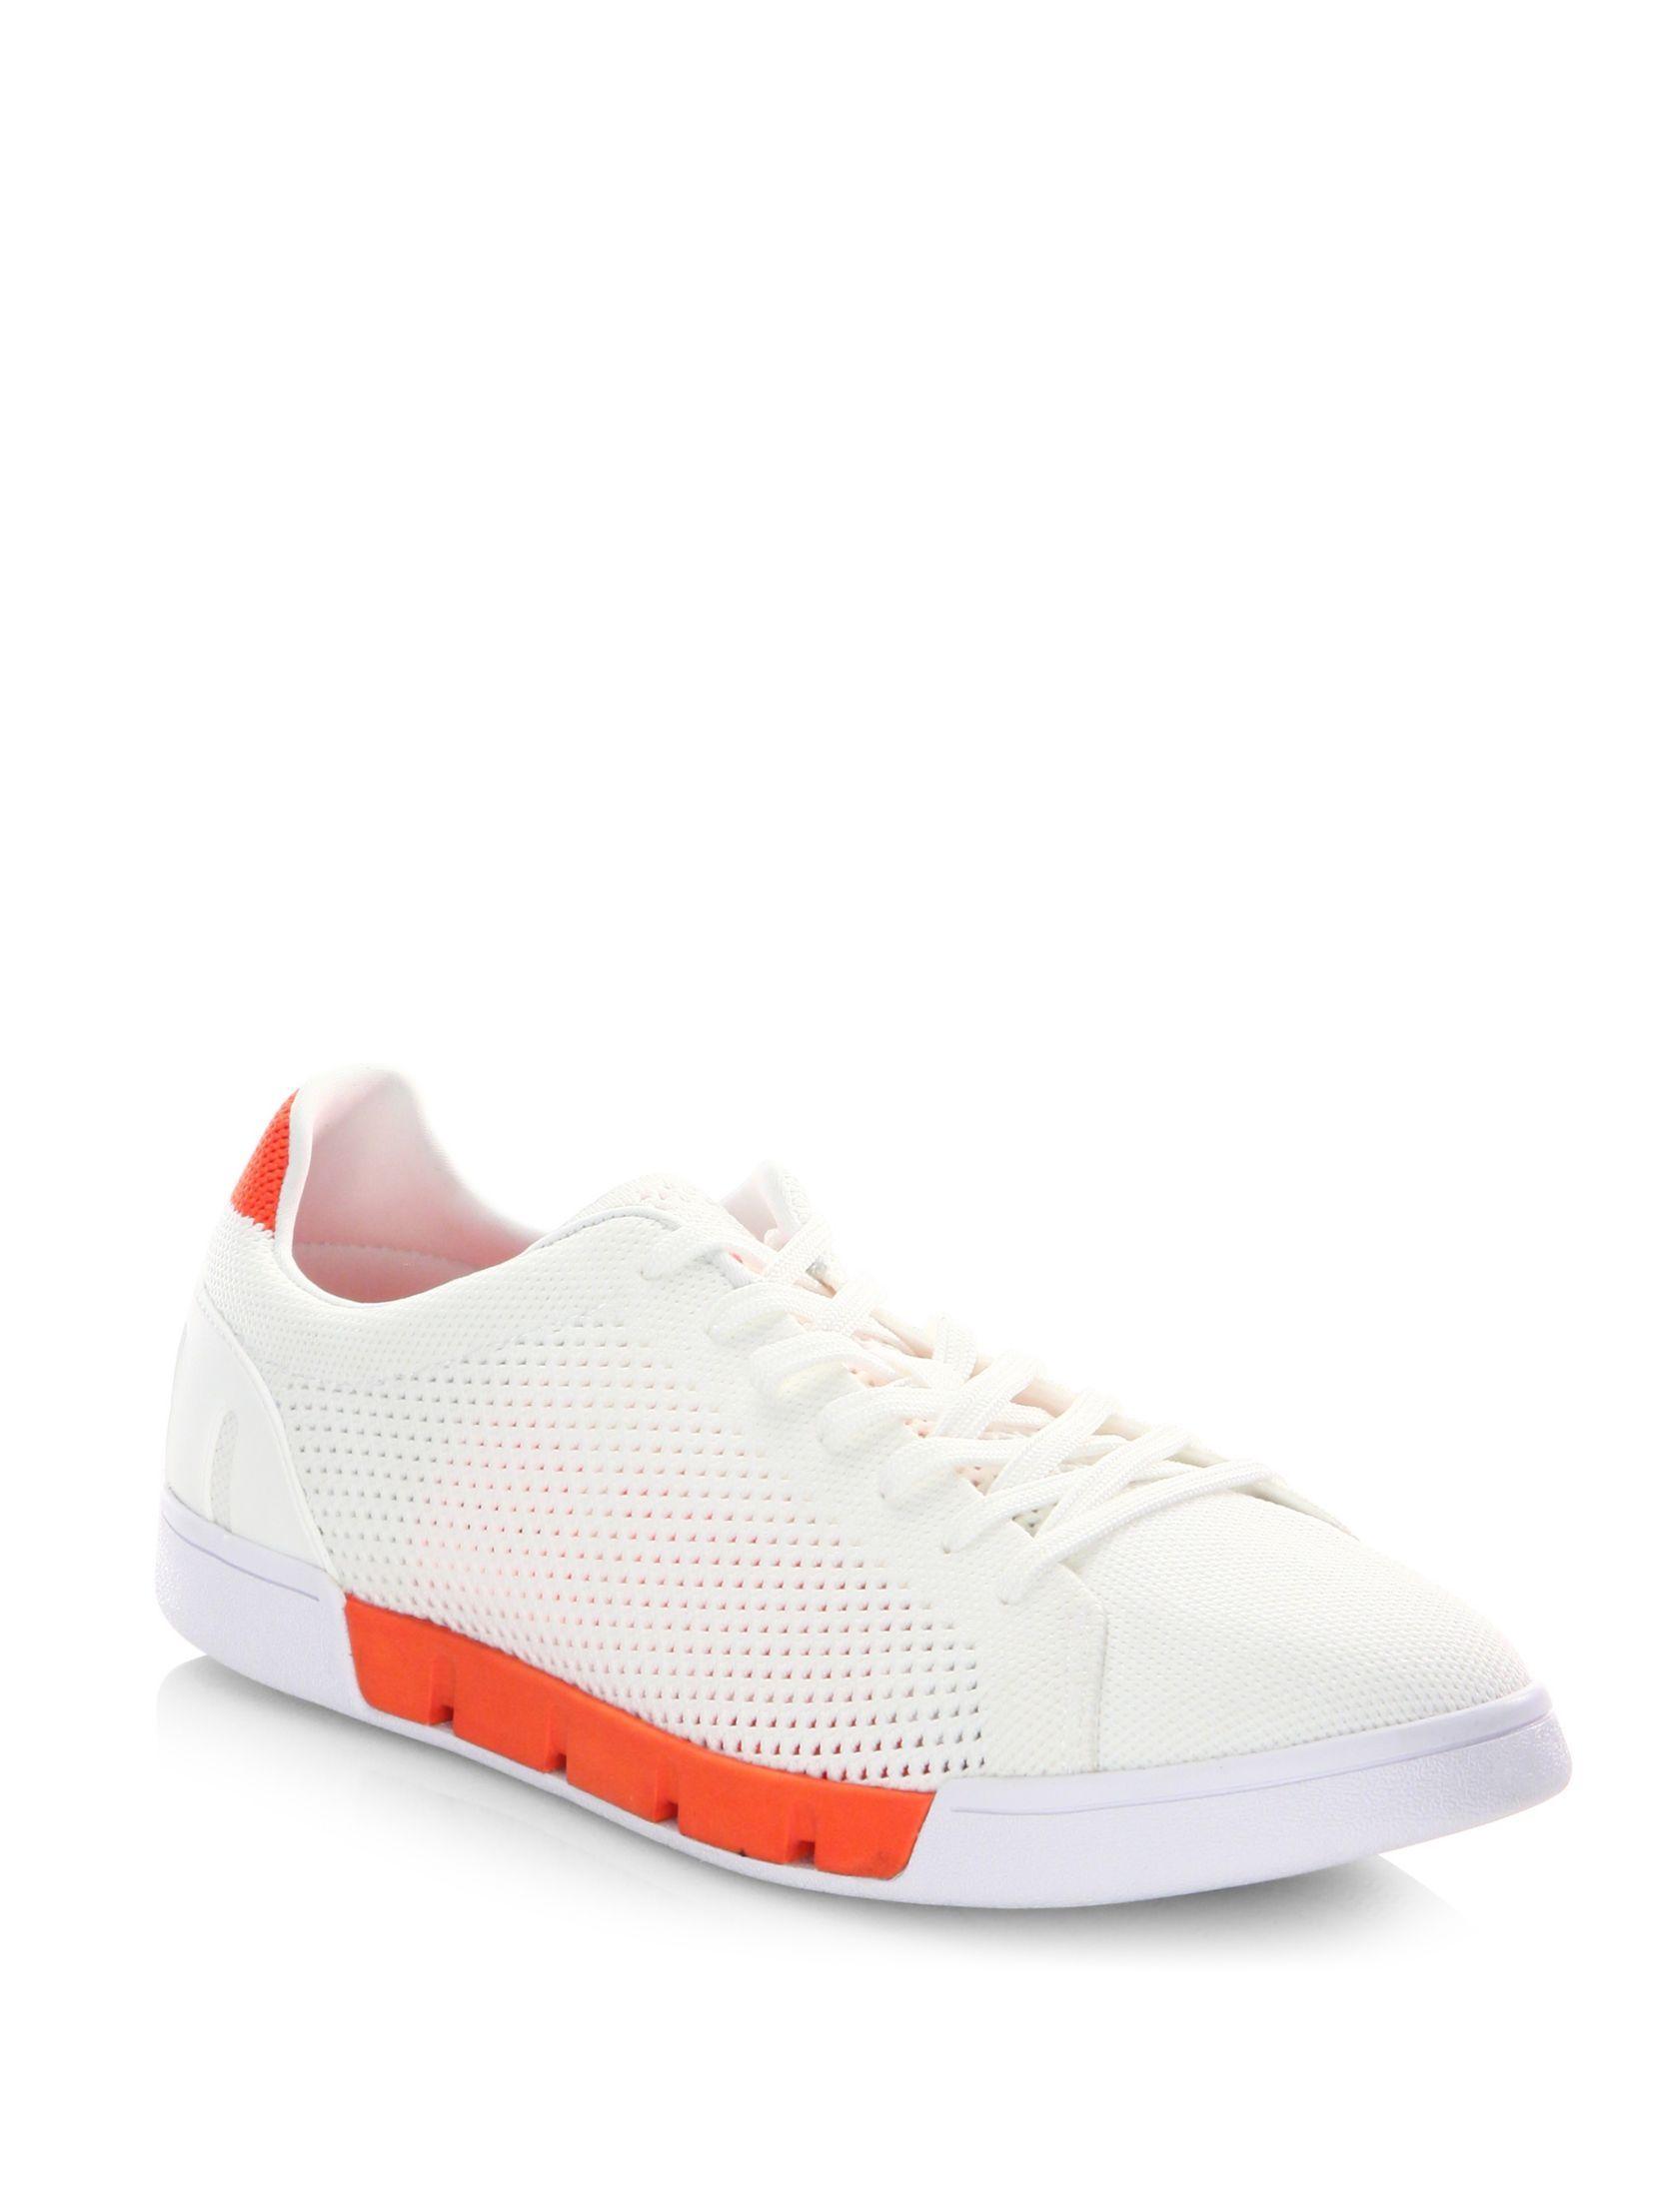 a5f3d3676952 Swims Breeze Tennis Knit Sneakers